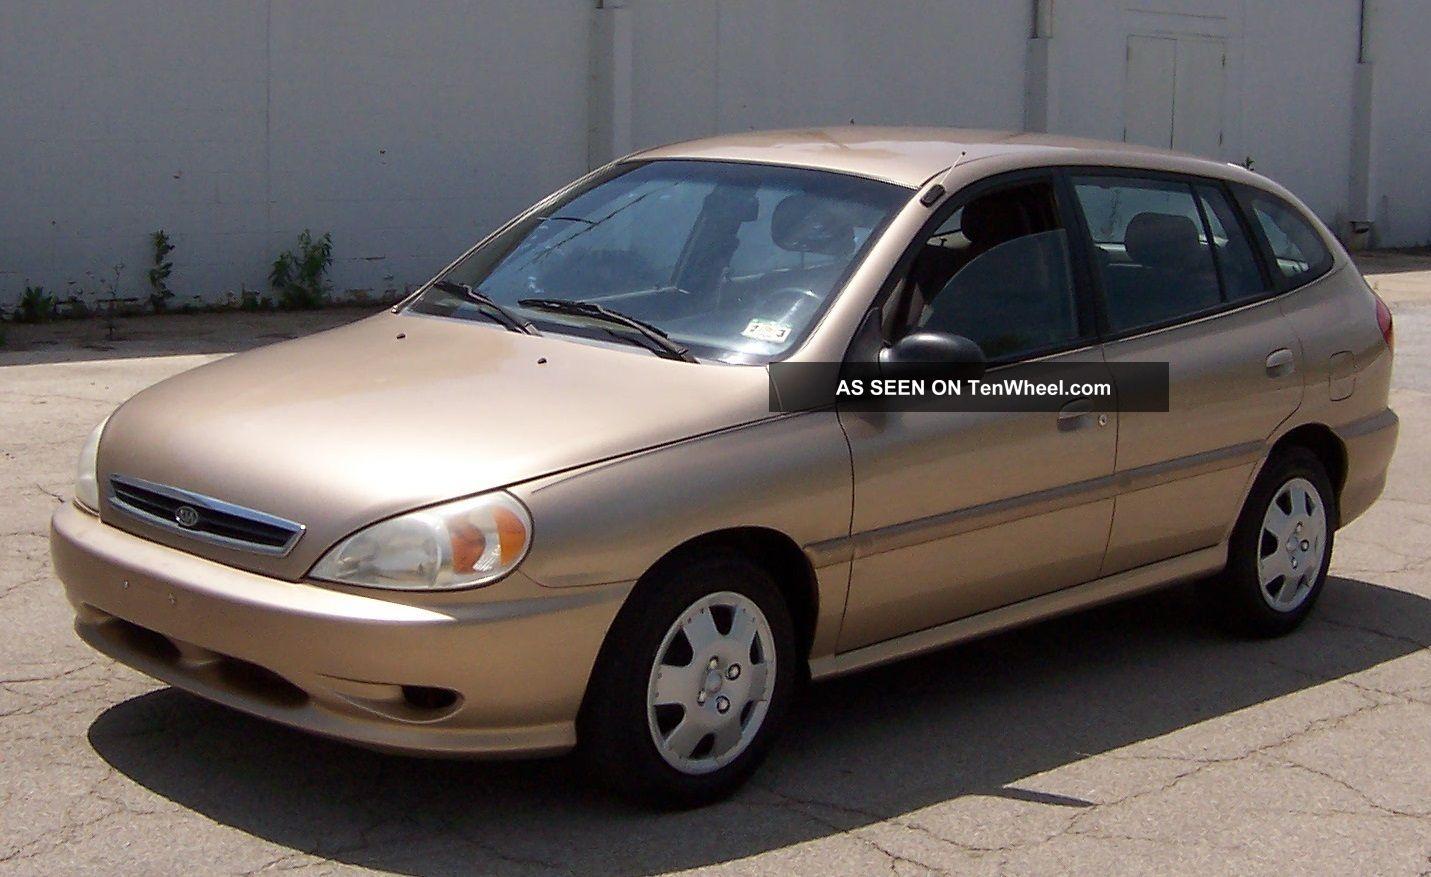 hight resolution of 2002 kia rio 4 door sedan great inexpensive economical reliable transportation